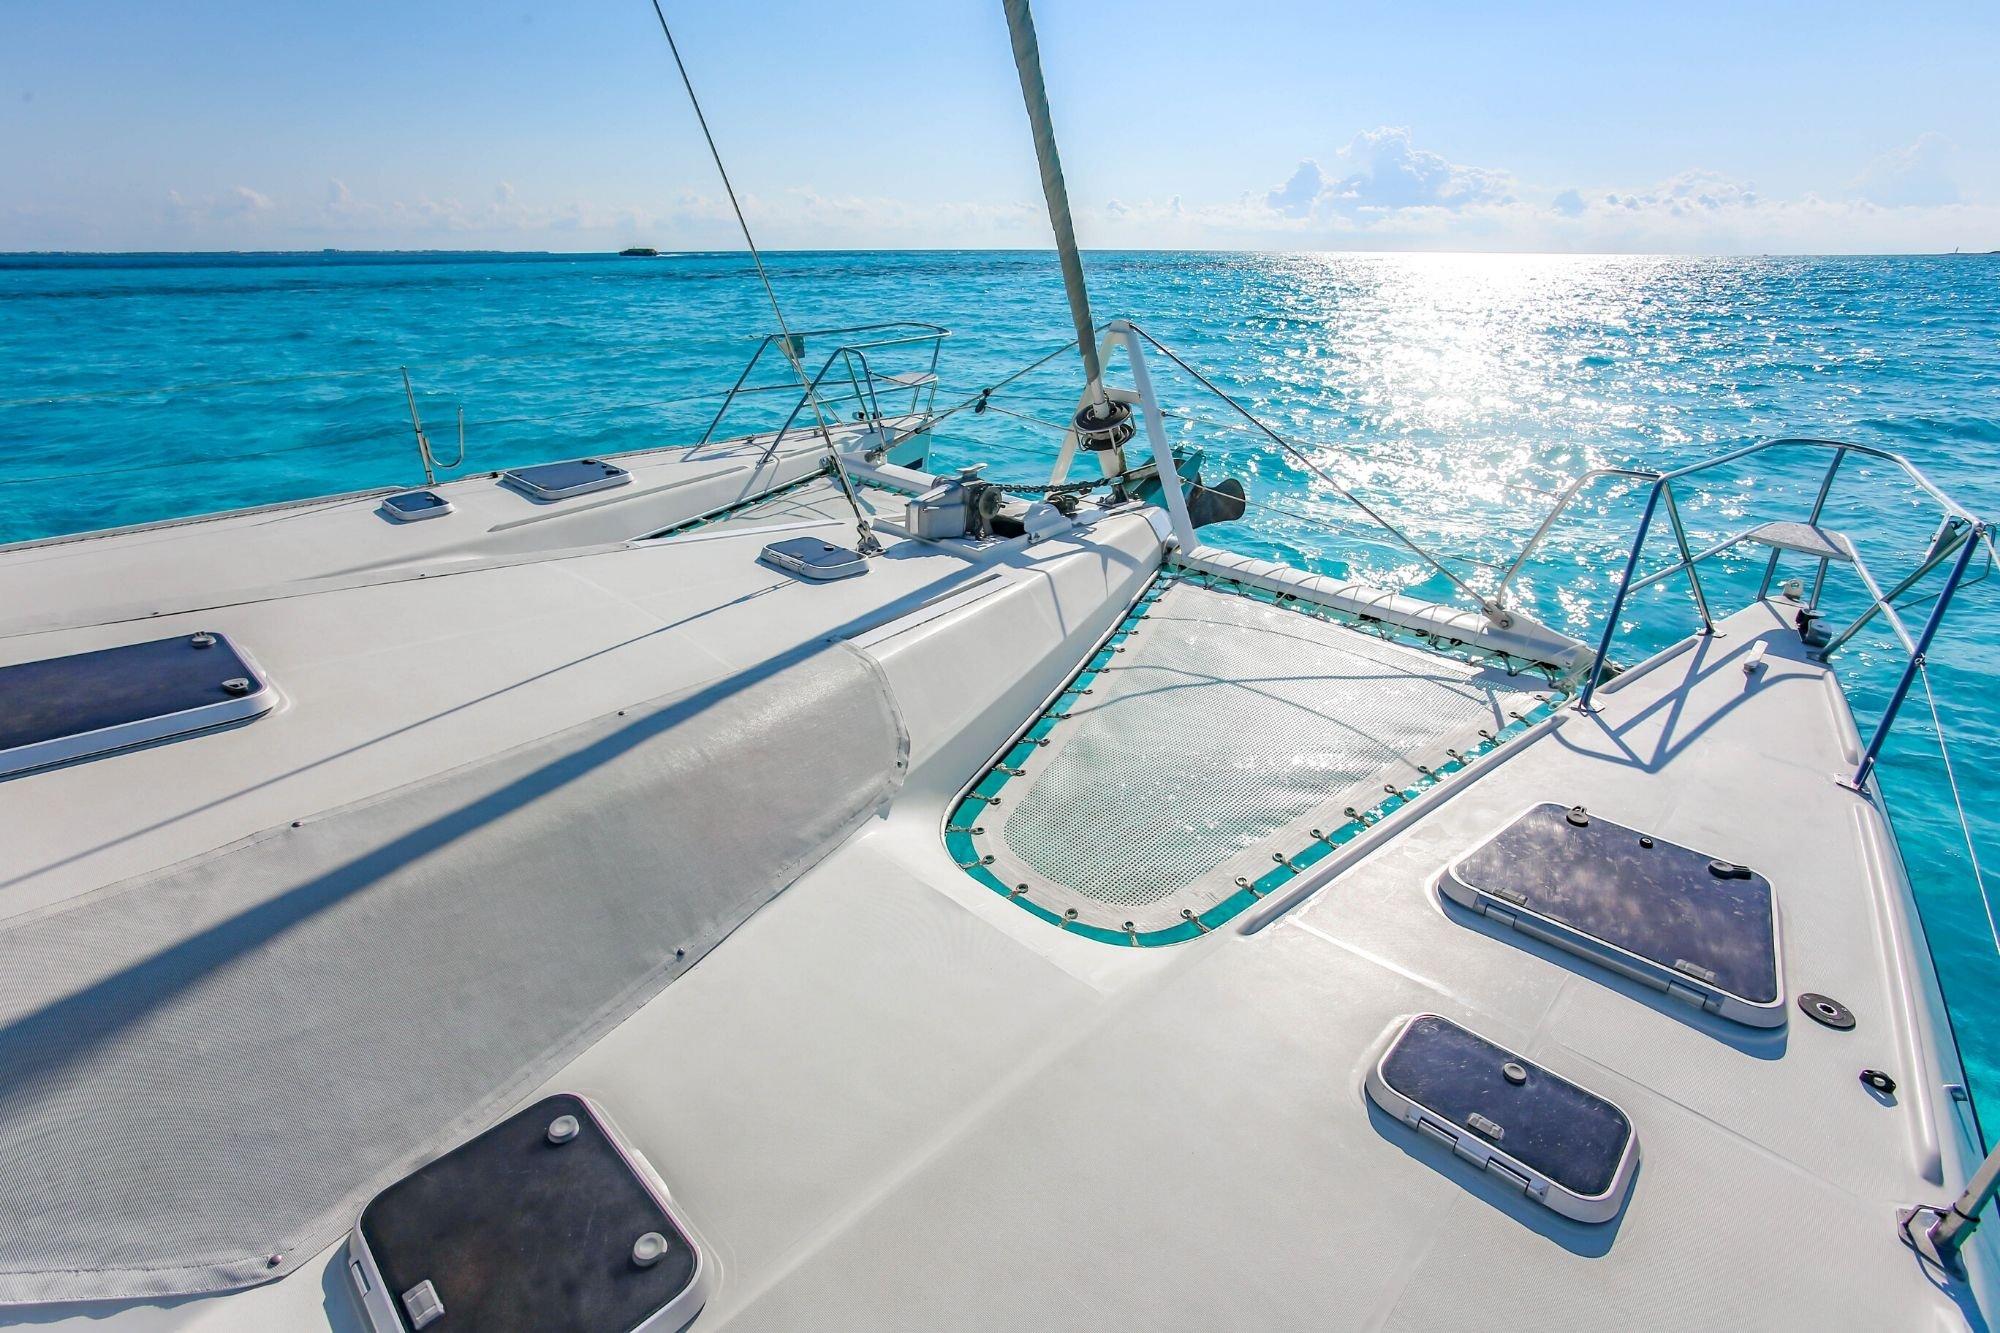 Arjuna - Isla Mujeres Catamaran Tour - Cancun Sailing - 1